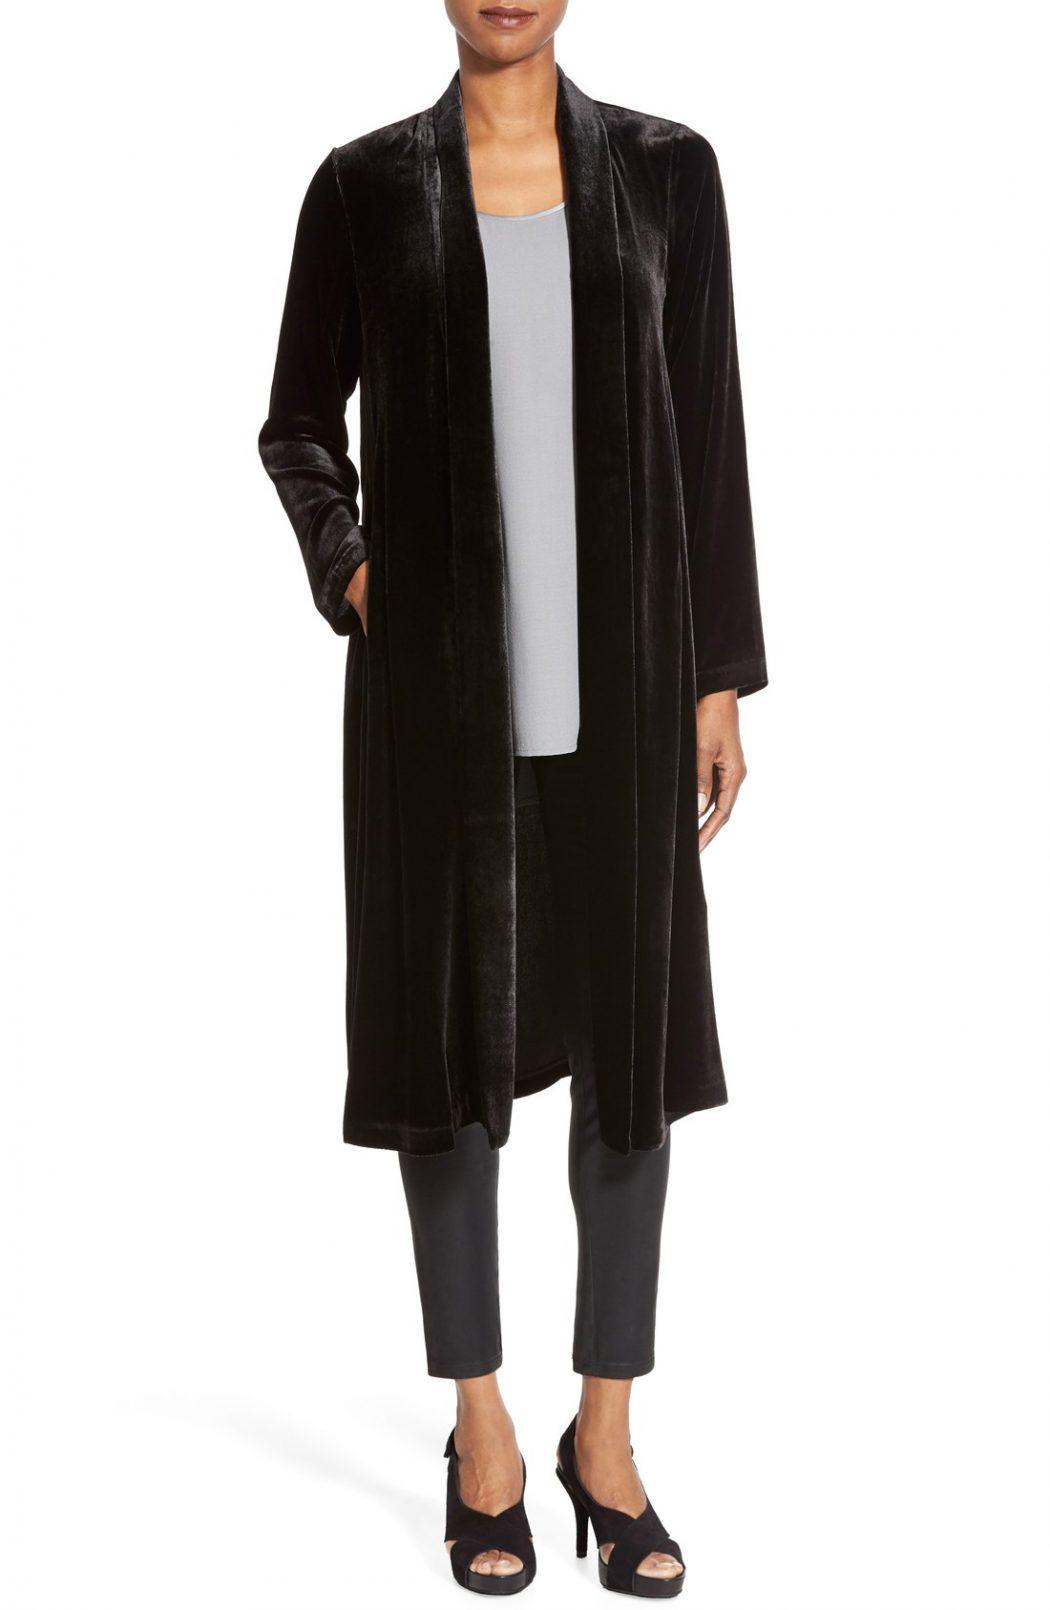 Long-Black-Coat2 8 Main Winter & Fall Jackets & Coats Trends in 2018